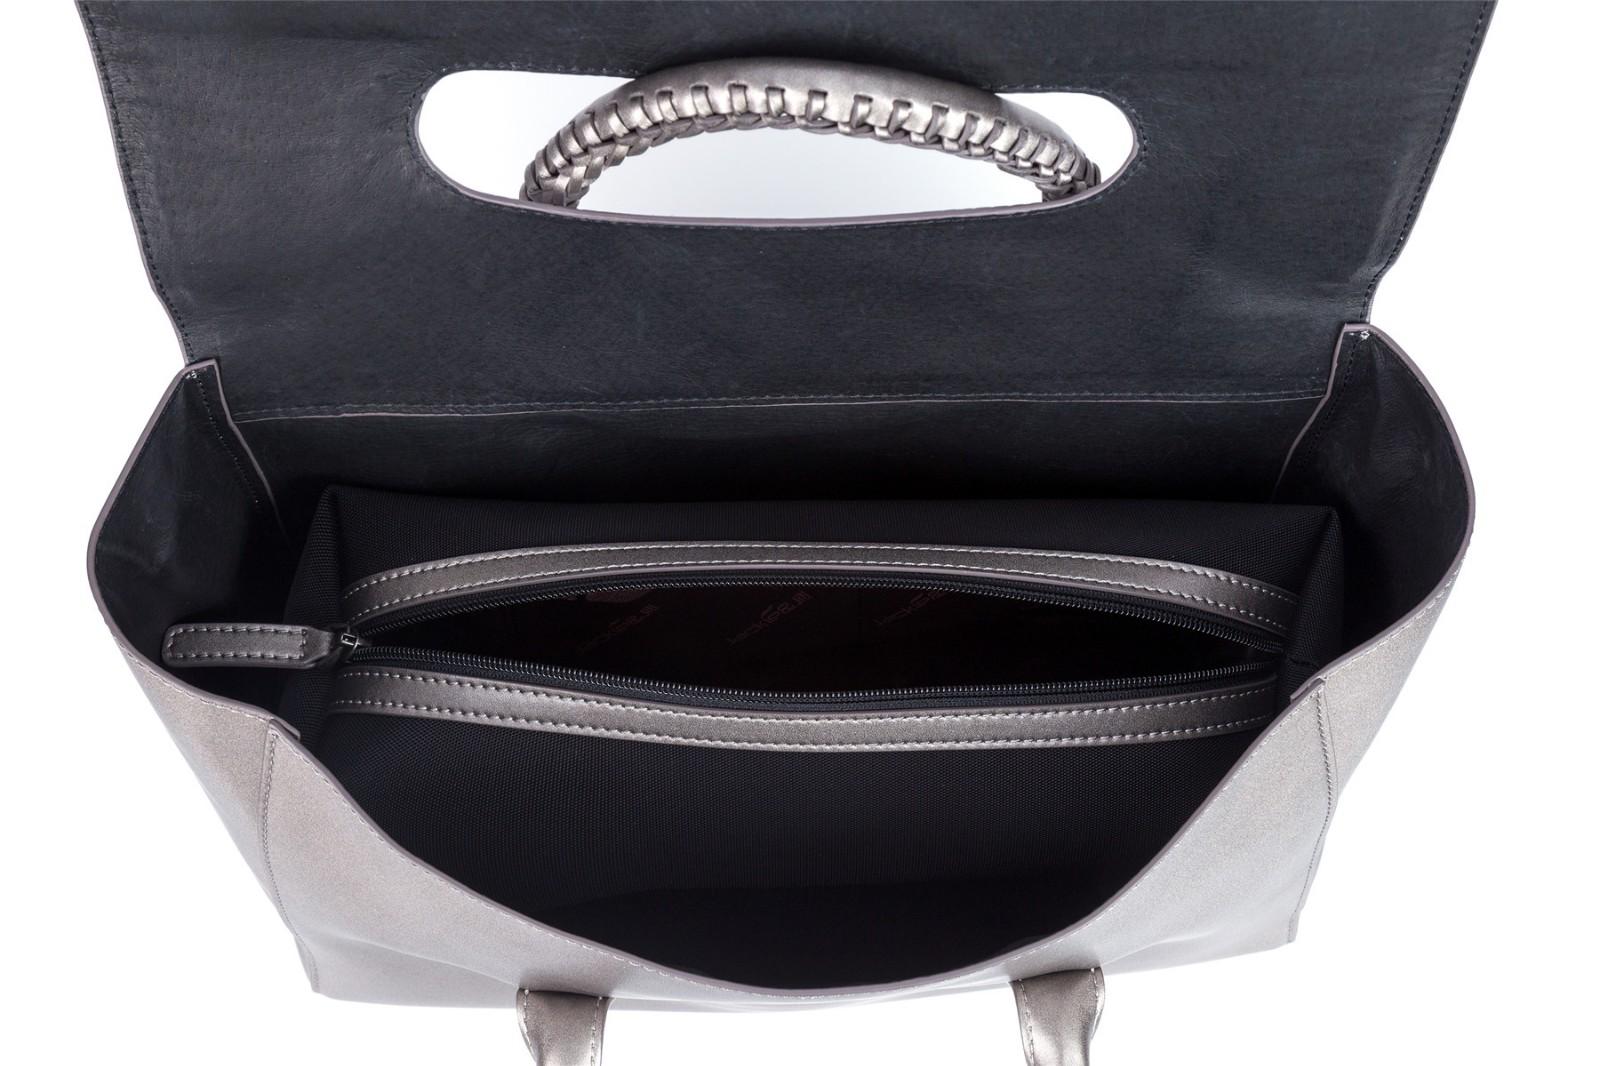 GF bags-Bulk Luxury Handbags Manufacturer, Affordable Handbags   Gf Bags-6